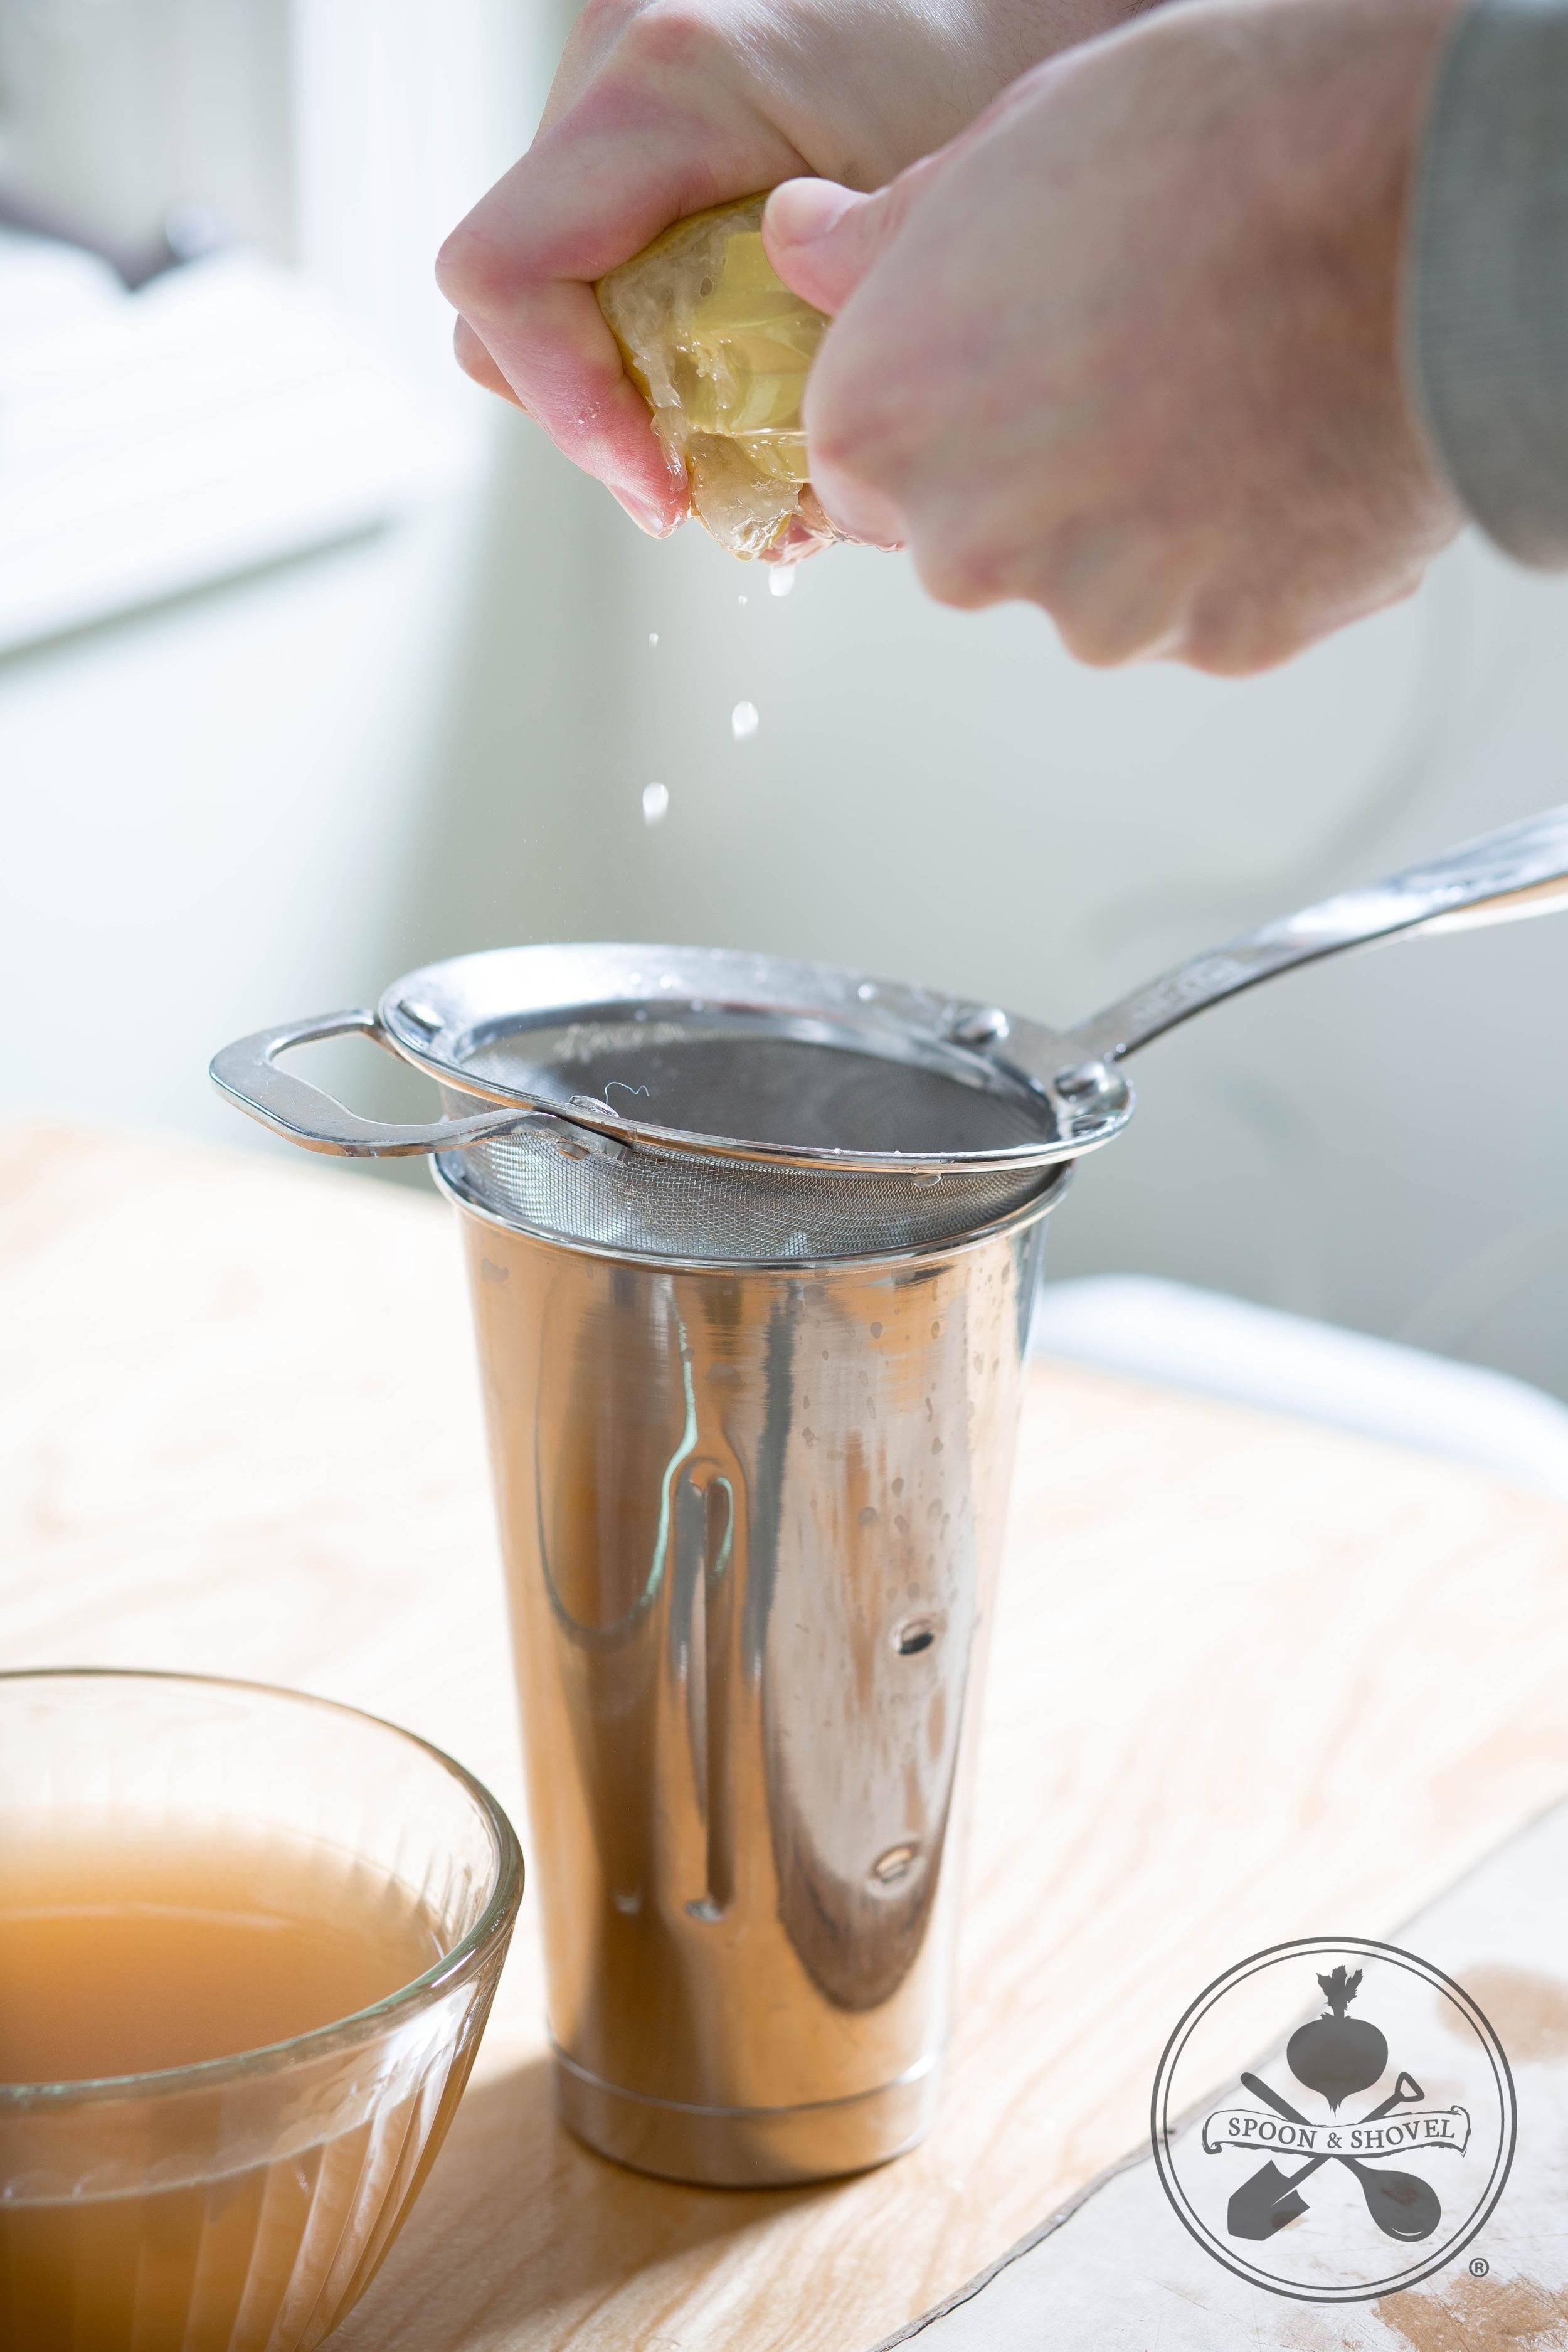 All-purpose vegan white sauce from The Spoon + Shovel